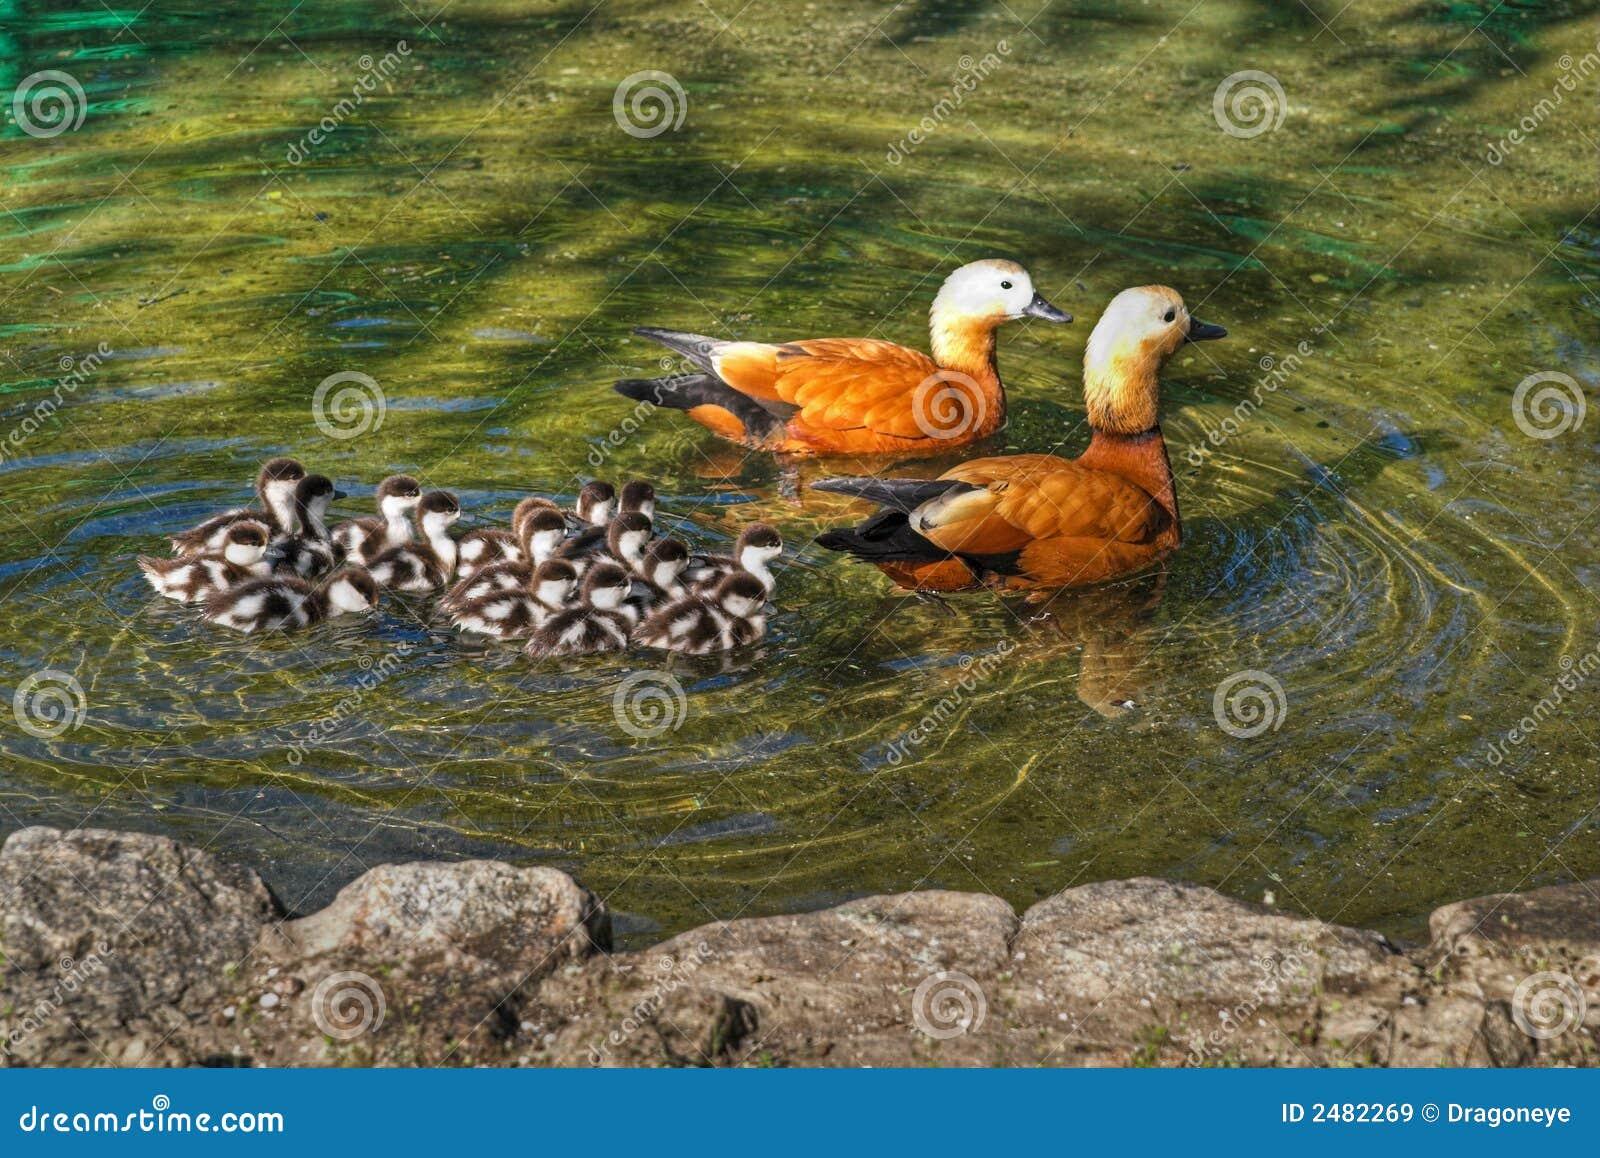 Roody shelduck family in pond